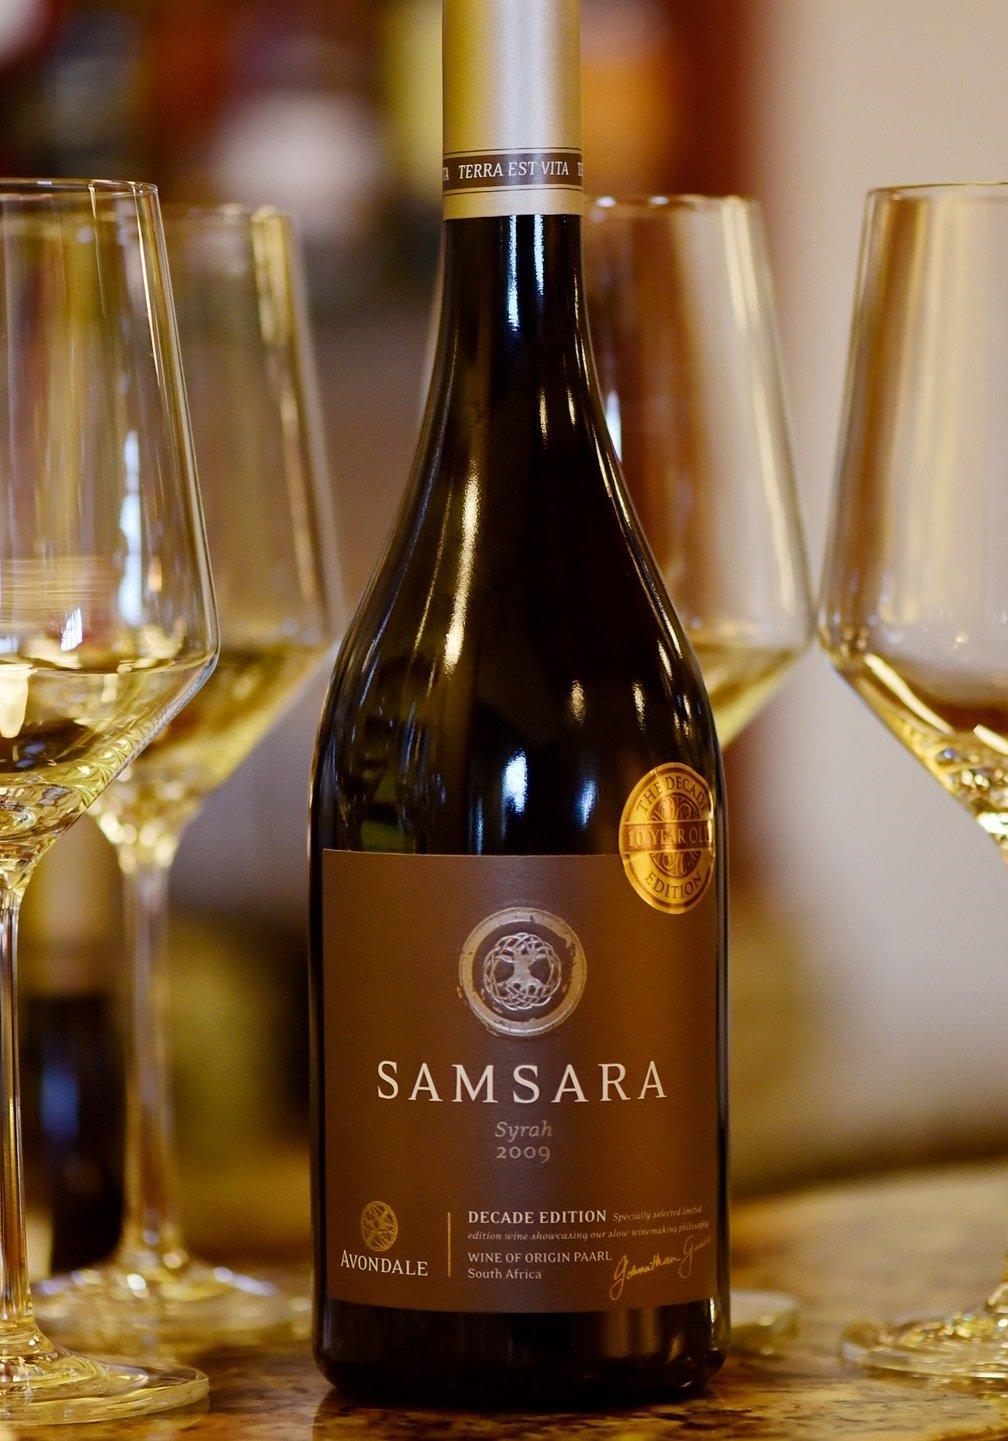 samsara edition 2009 avondale steak night sonia cabano blog eatdrinkcapetown